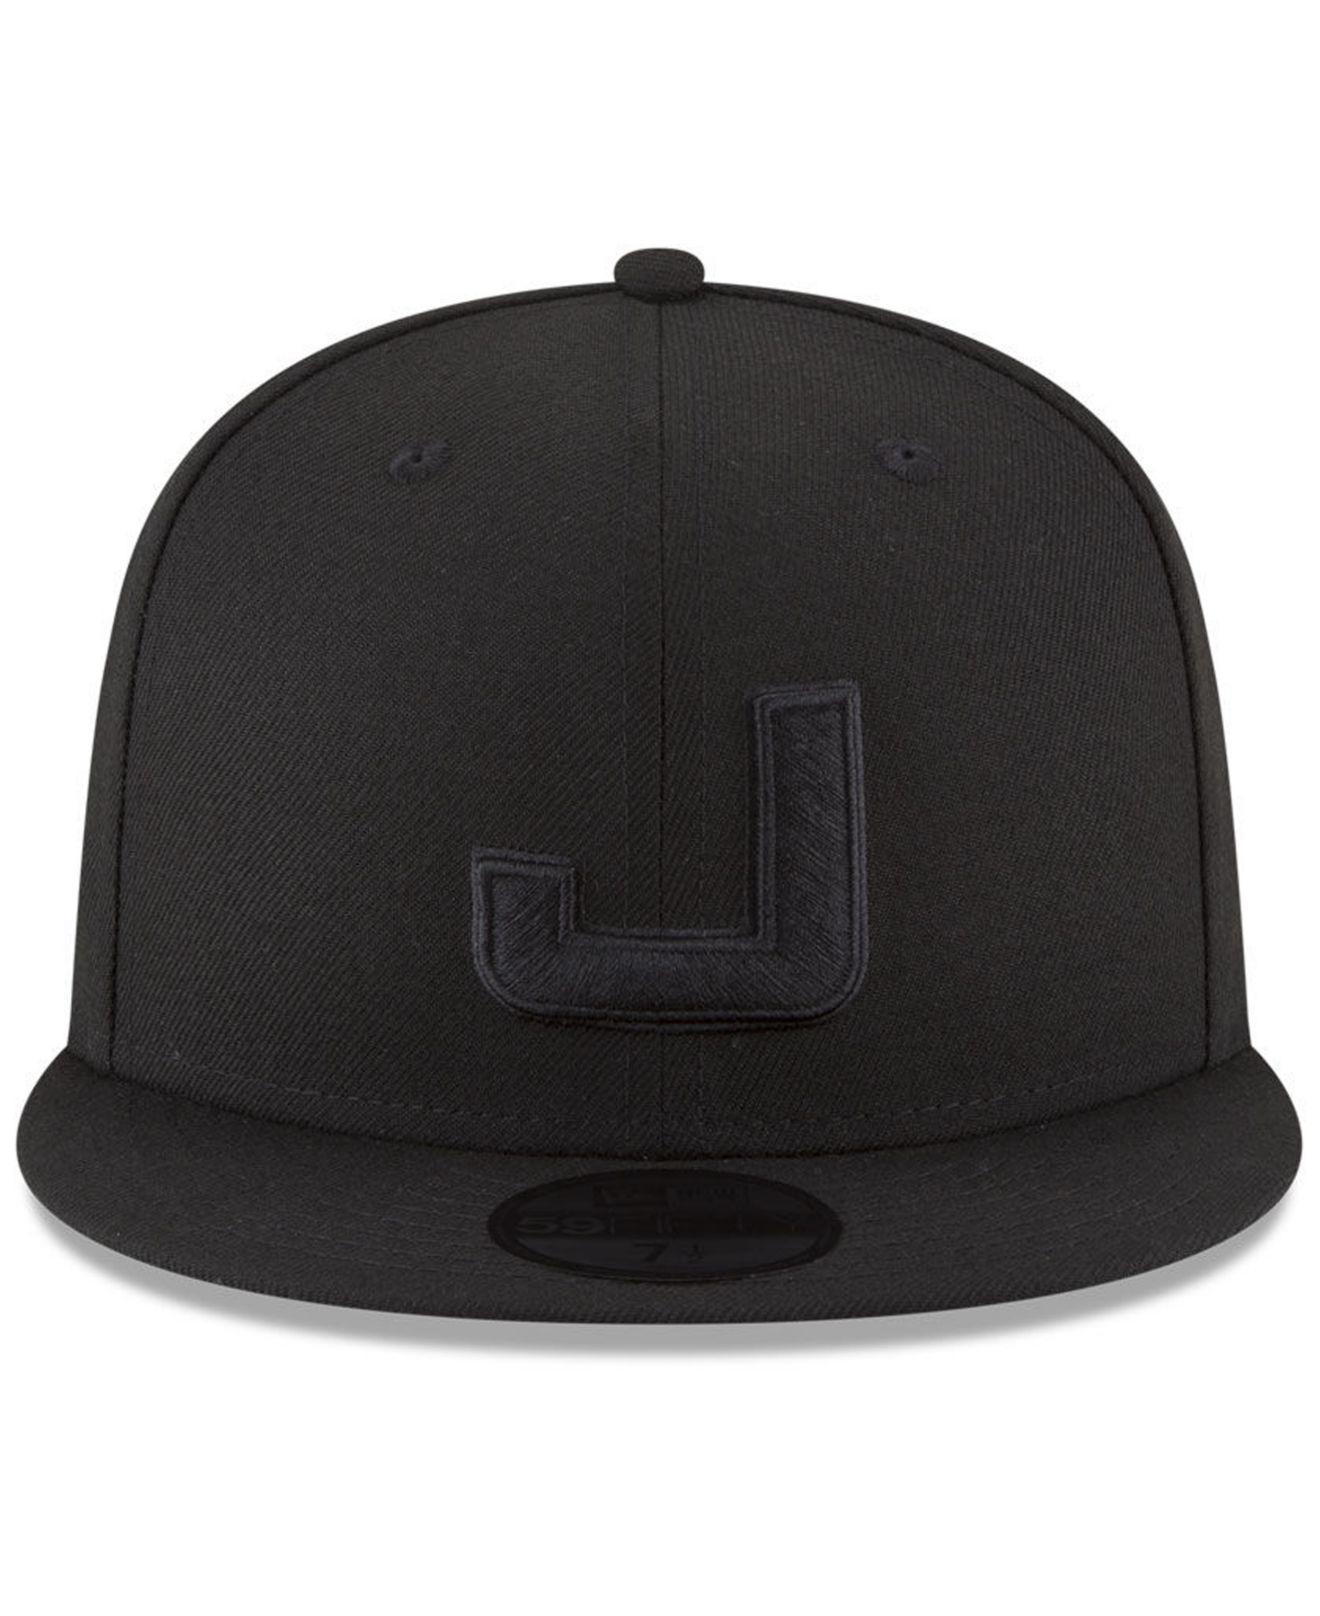 Lyst - KTZ Utah Jazz Alpha Triple Black 59fifty Fitted Cap in Black for Men 83b95bdbe